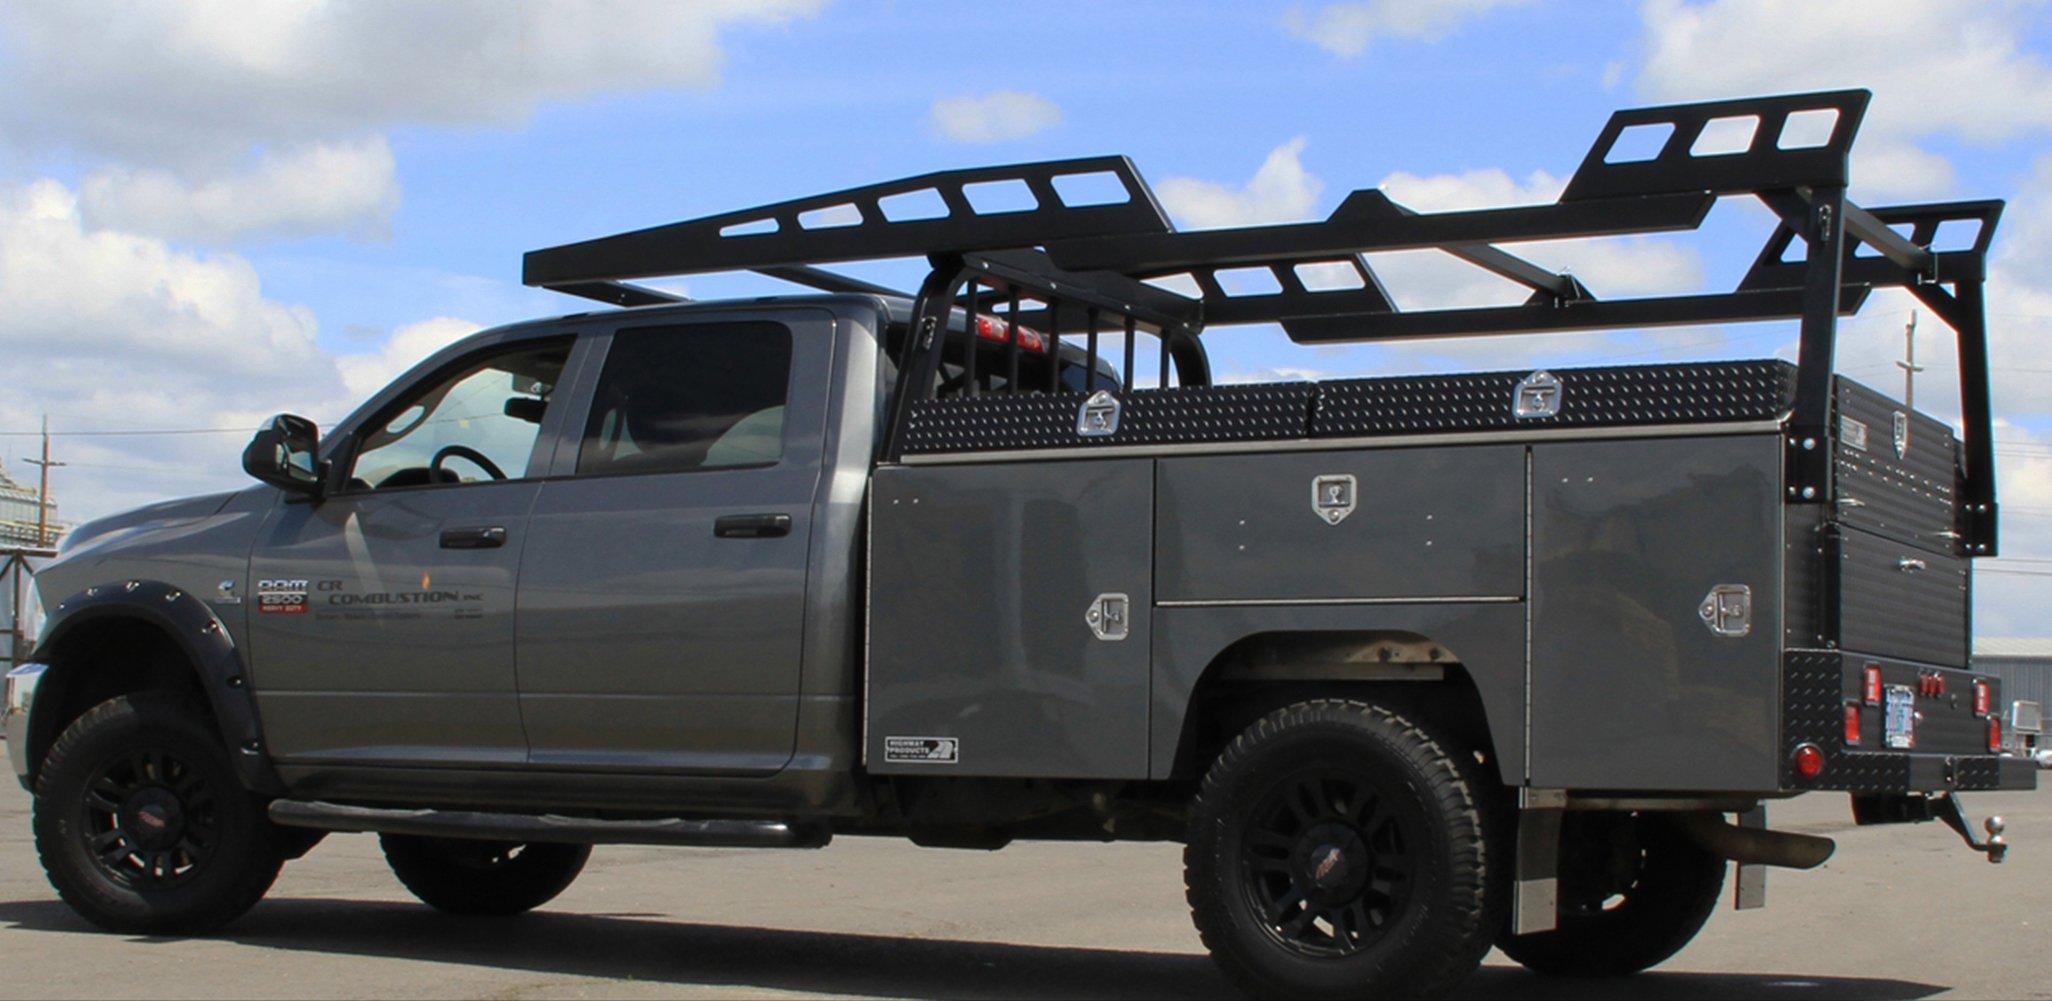 Aluminum Service Bodies Operations Work Truck Online